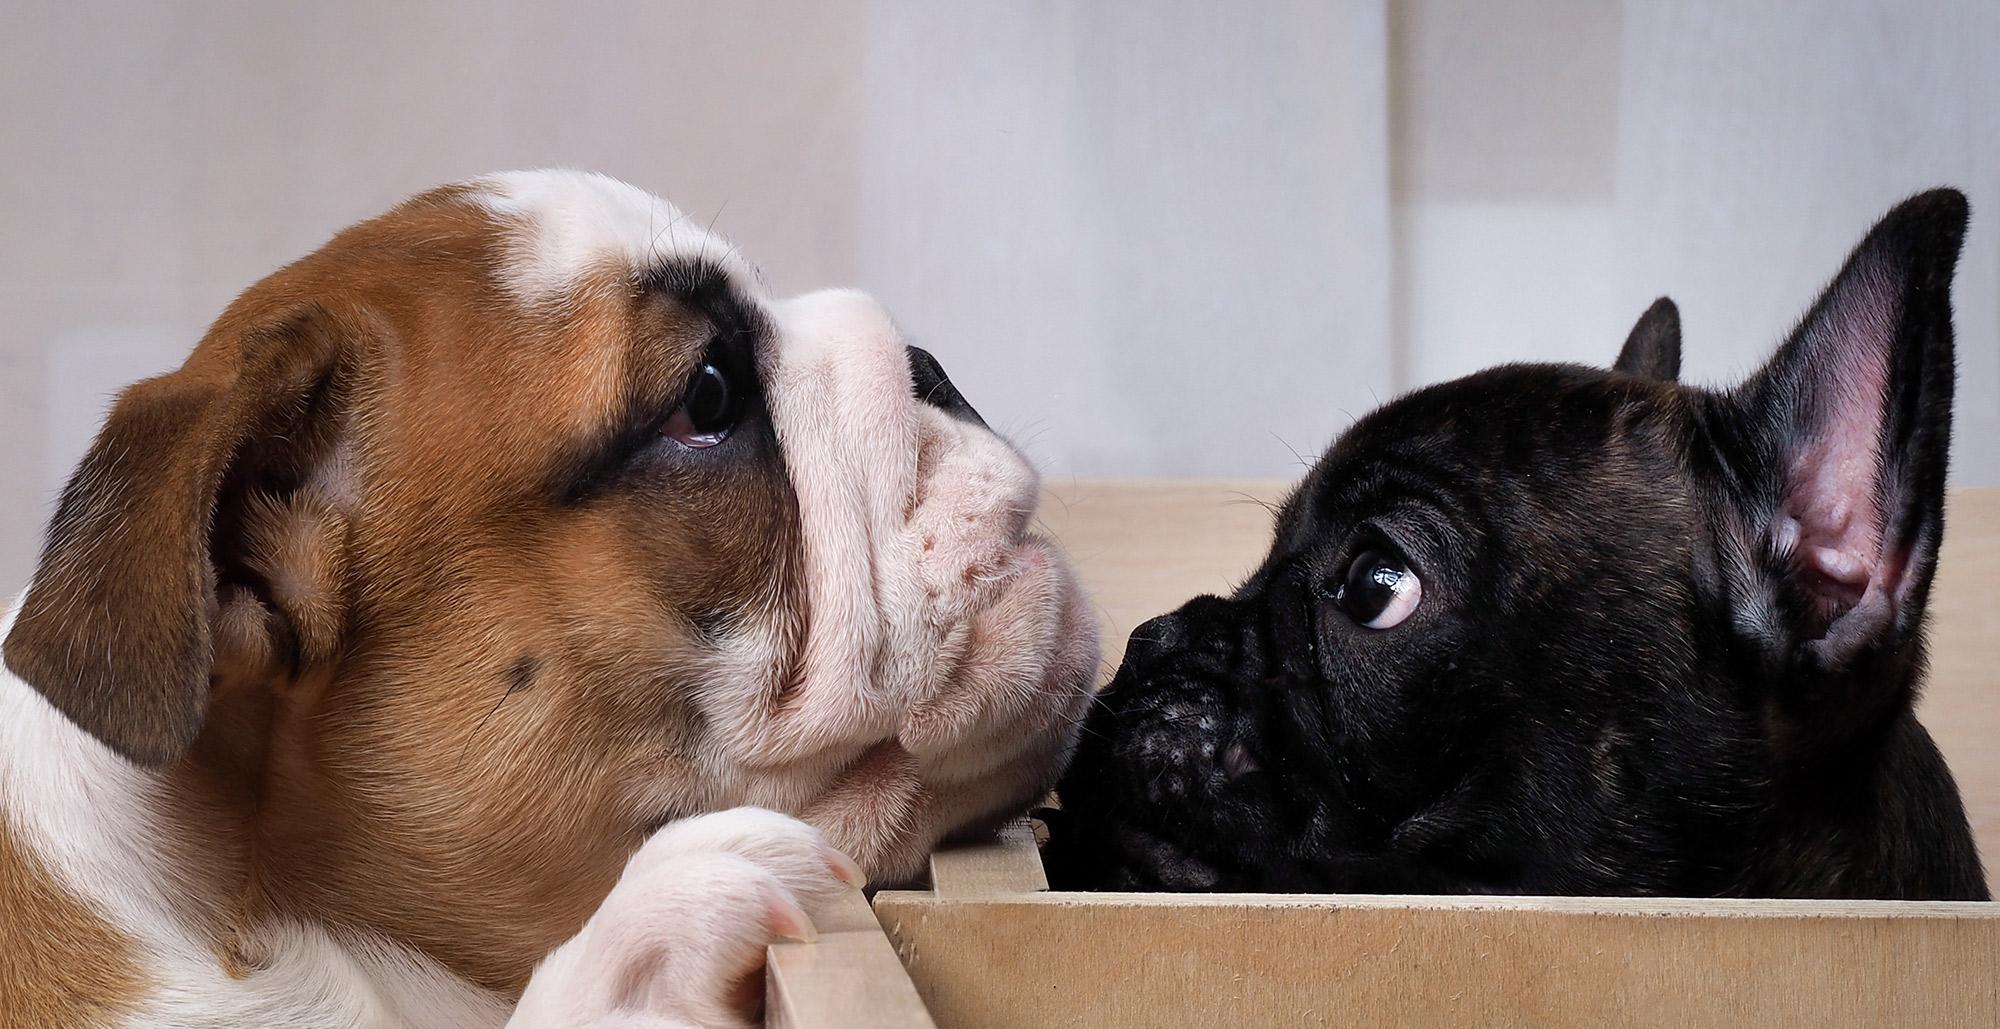 Bulldog Puppy and French Bulldog Puppy